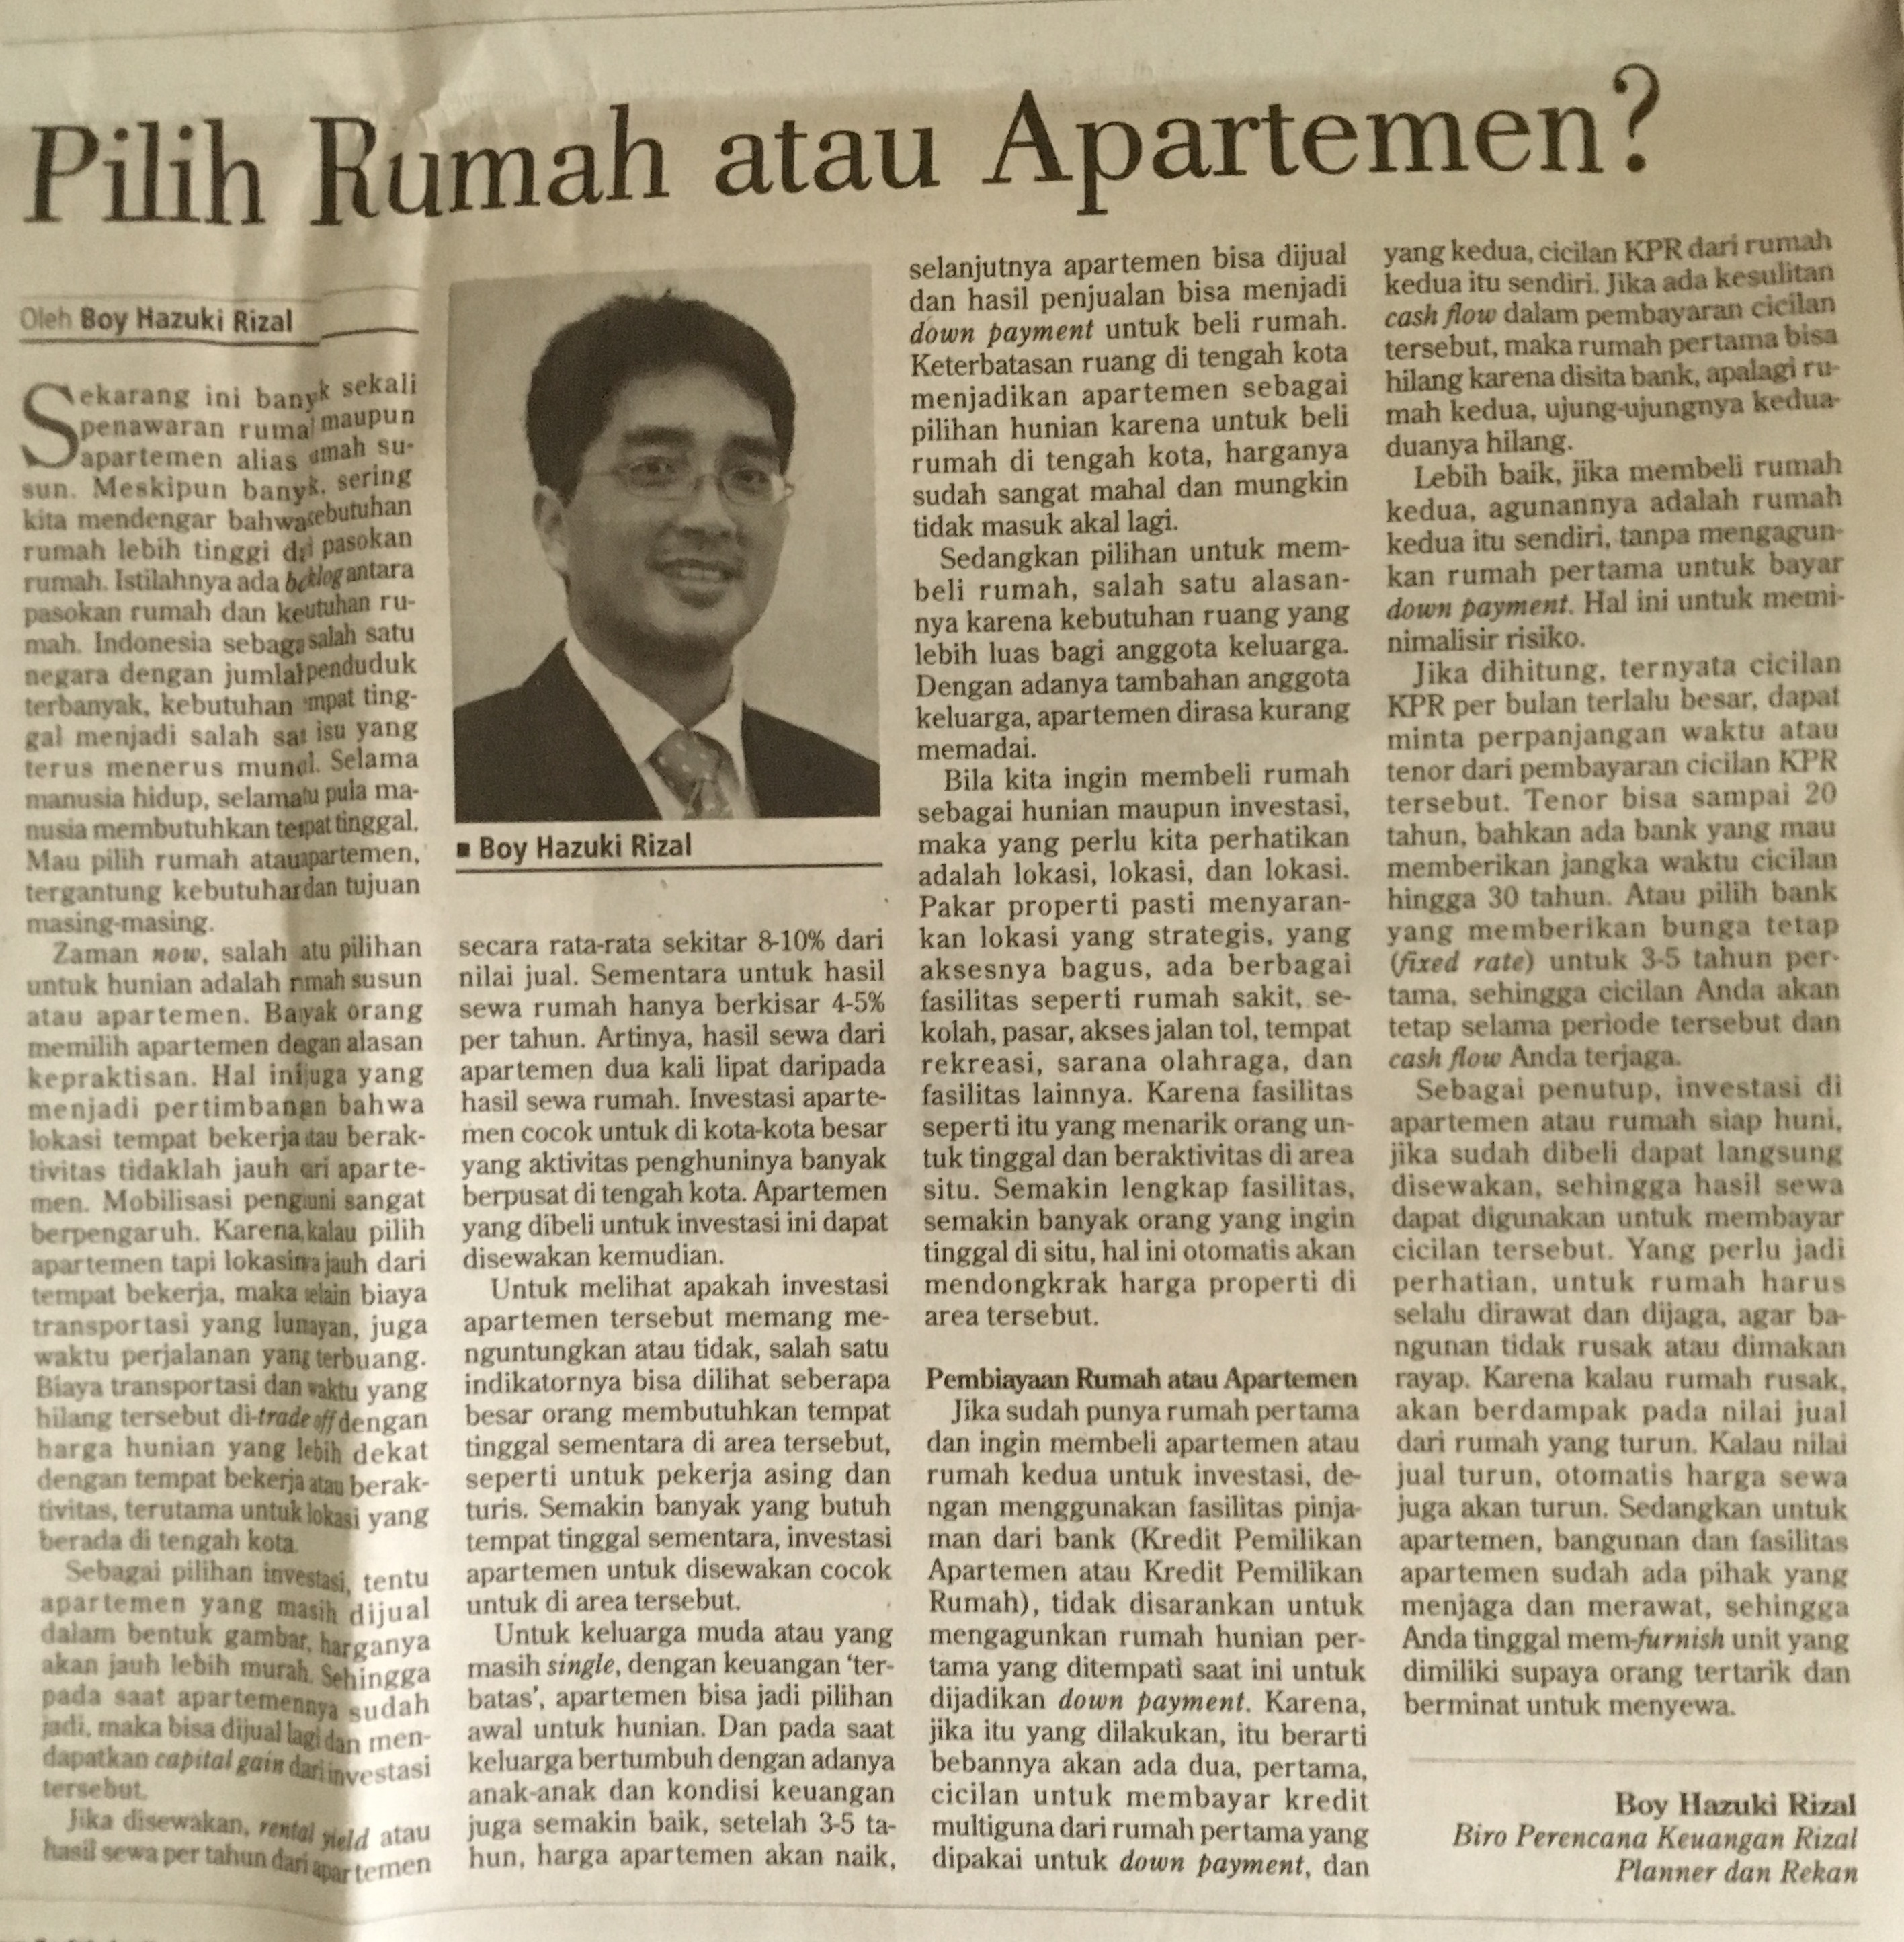 Boy Hazuki Rizal ID 5Aug18 Print